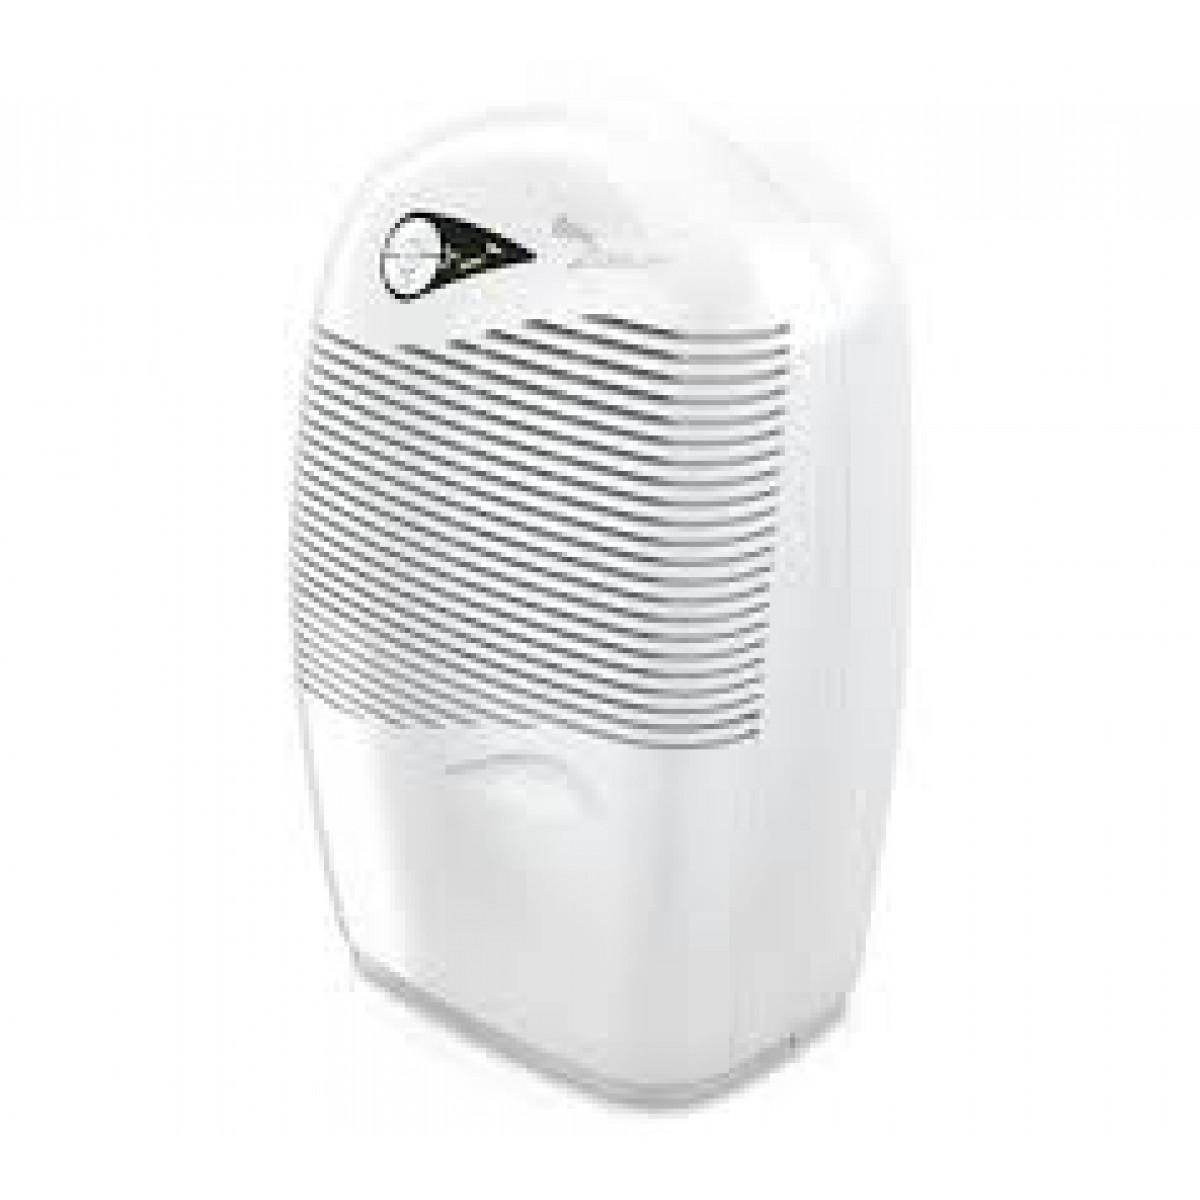 ebac 2650e 18 litre dehumidifier small appliances. Black Bedroom Furniture Sets. Home Design Ideas